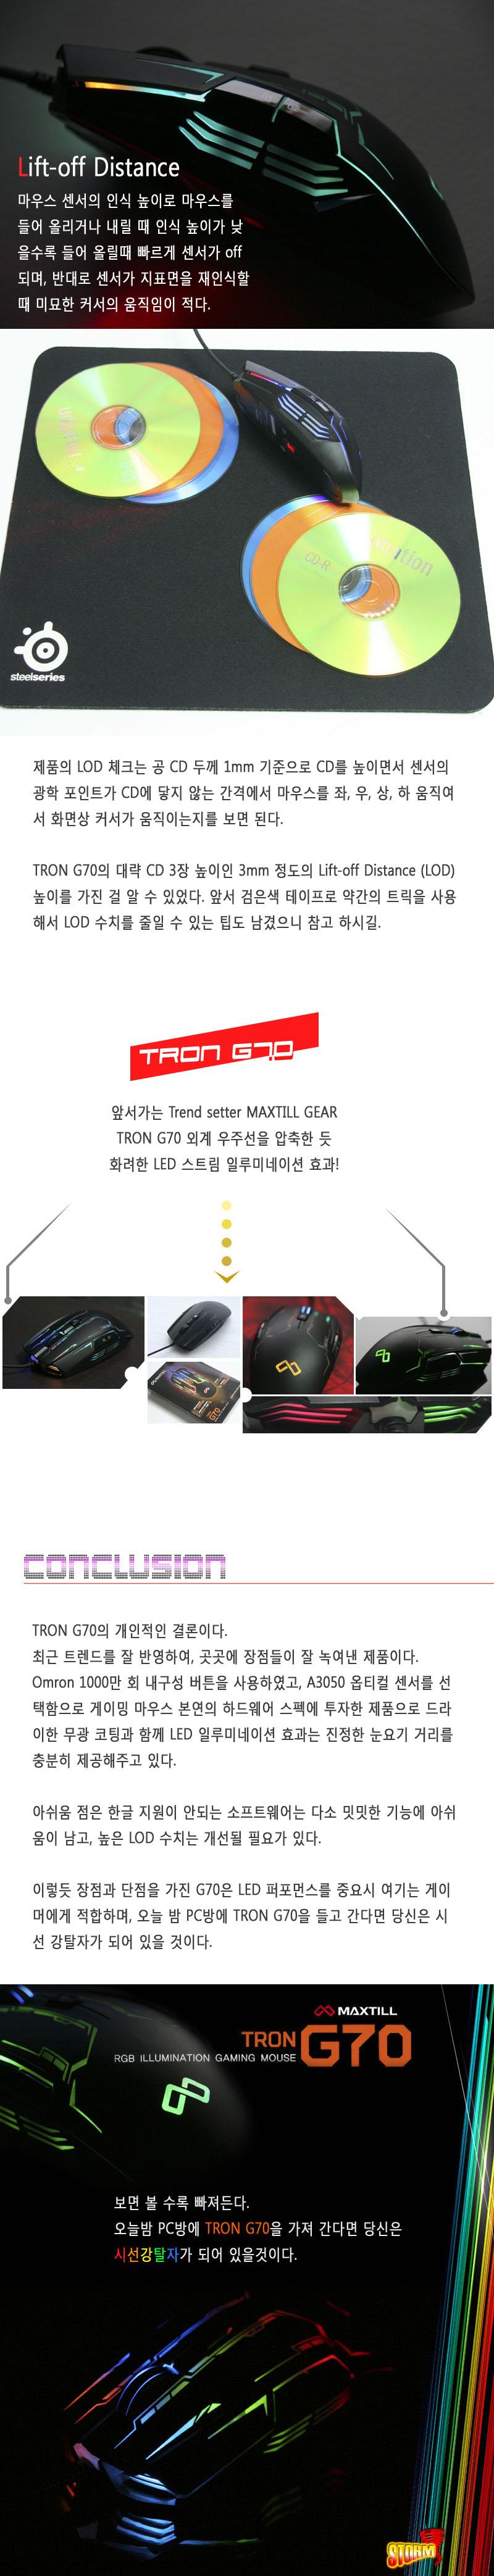 TRON G70 800 5.jpg